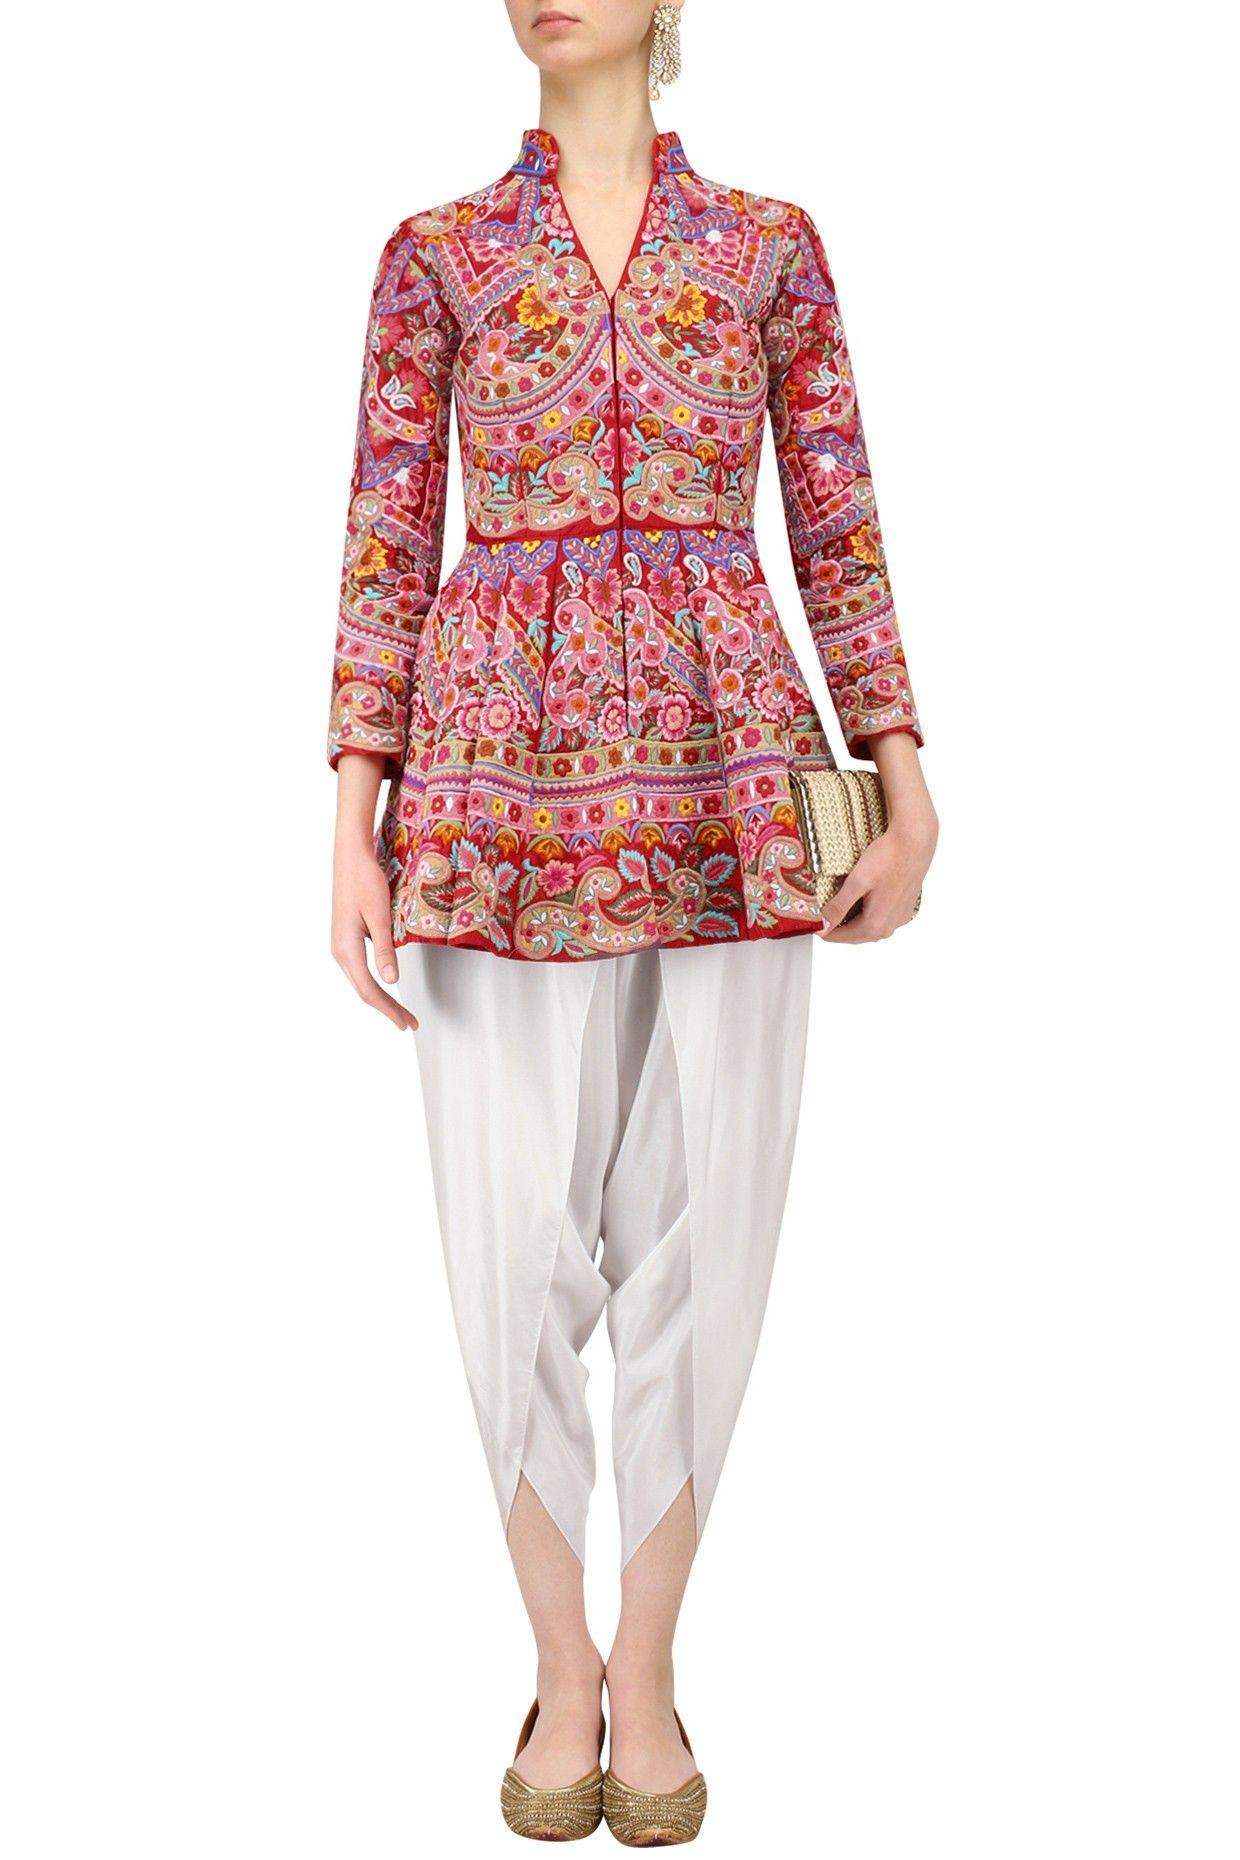 Sonali Gupta | Suits | Pinterest